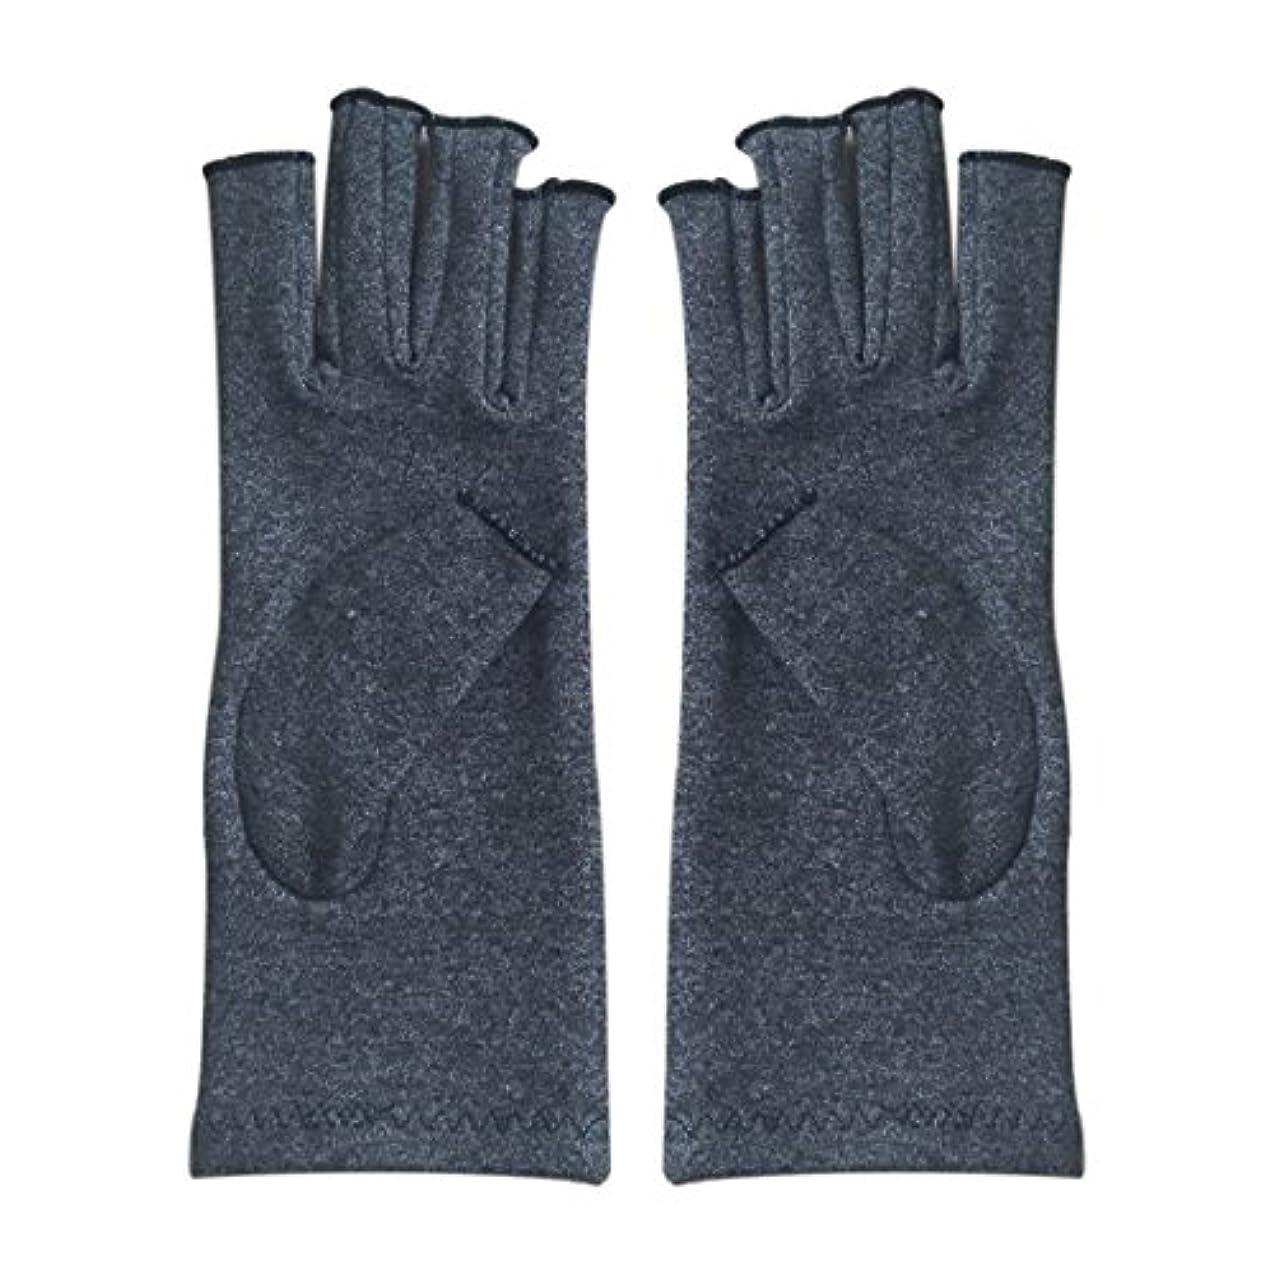 TOOGOO ペア 弾性コットンコンプレッション手袋 ユニセックス 関節炎 関節痛 鎮痛 軽減 S 灰色